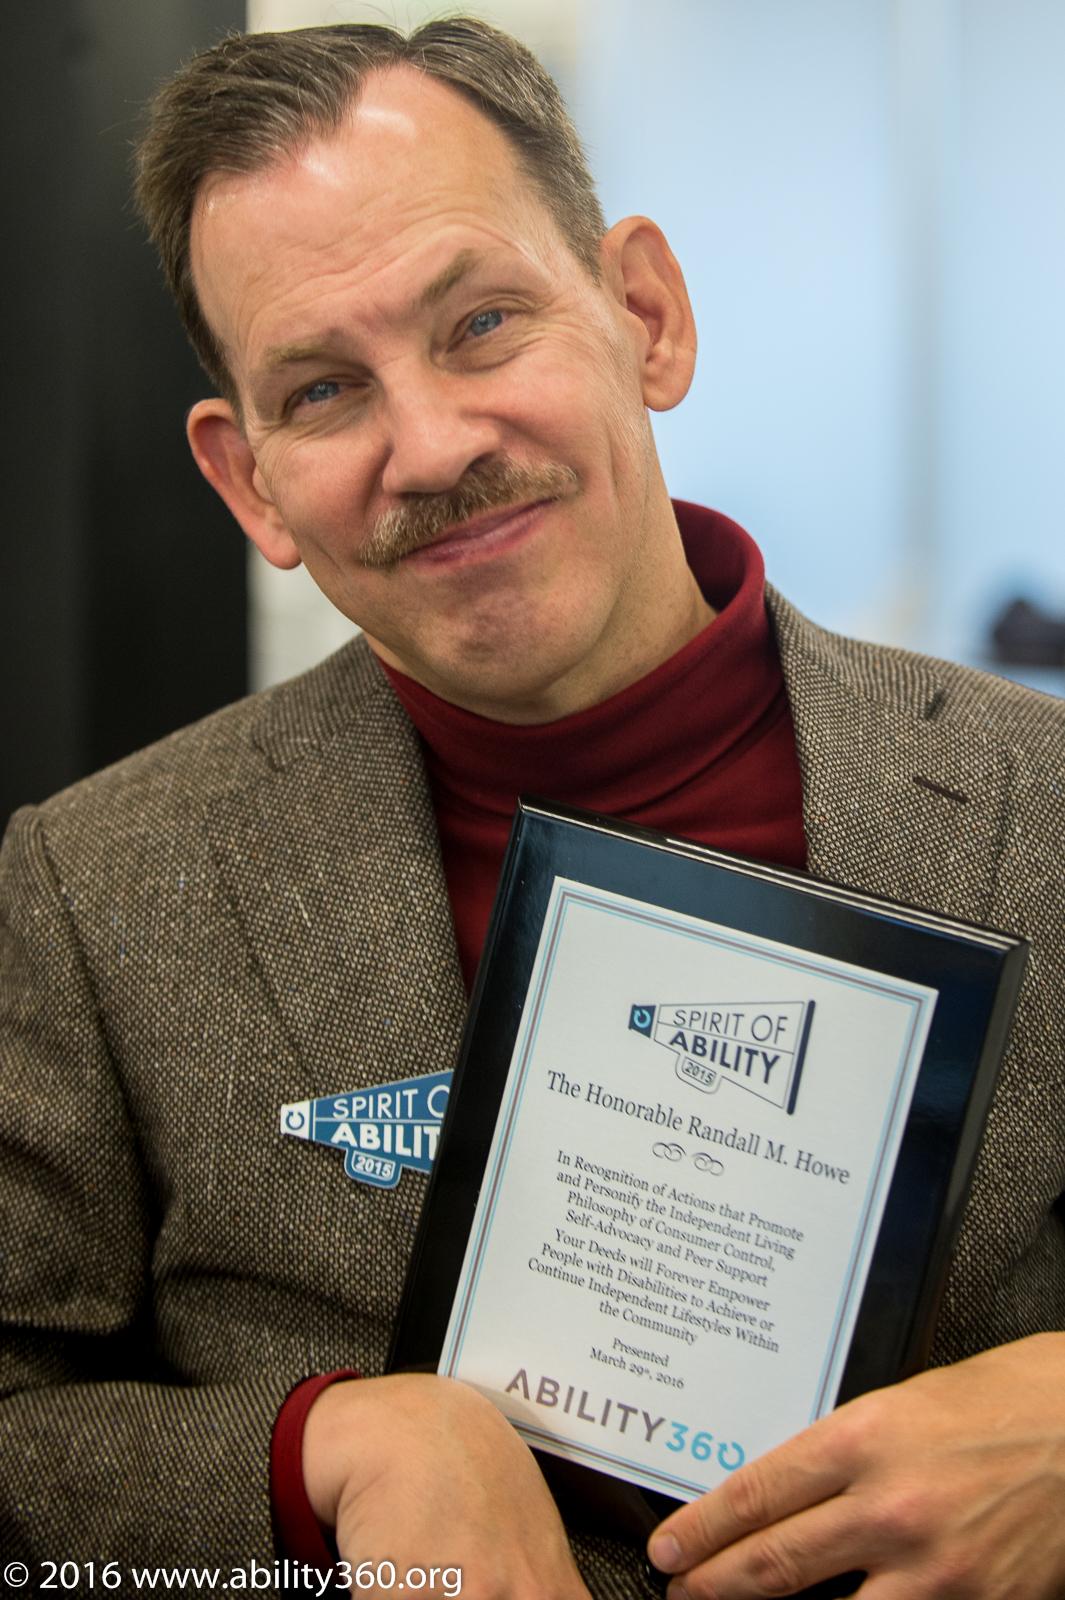 2015 Spirit of Ability award recipient, Randy Howe